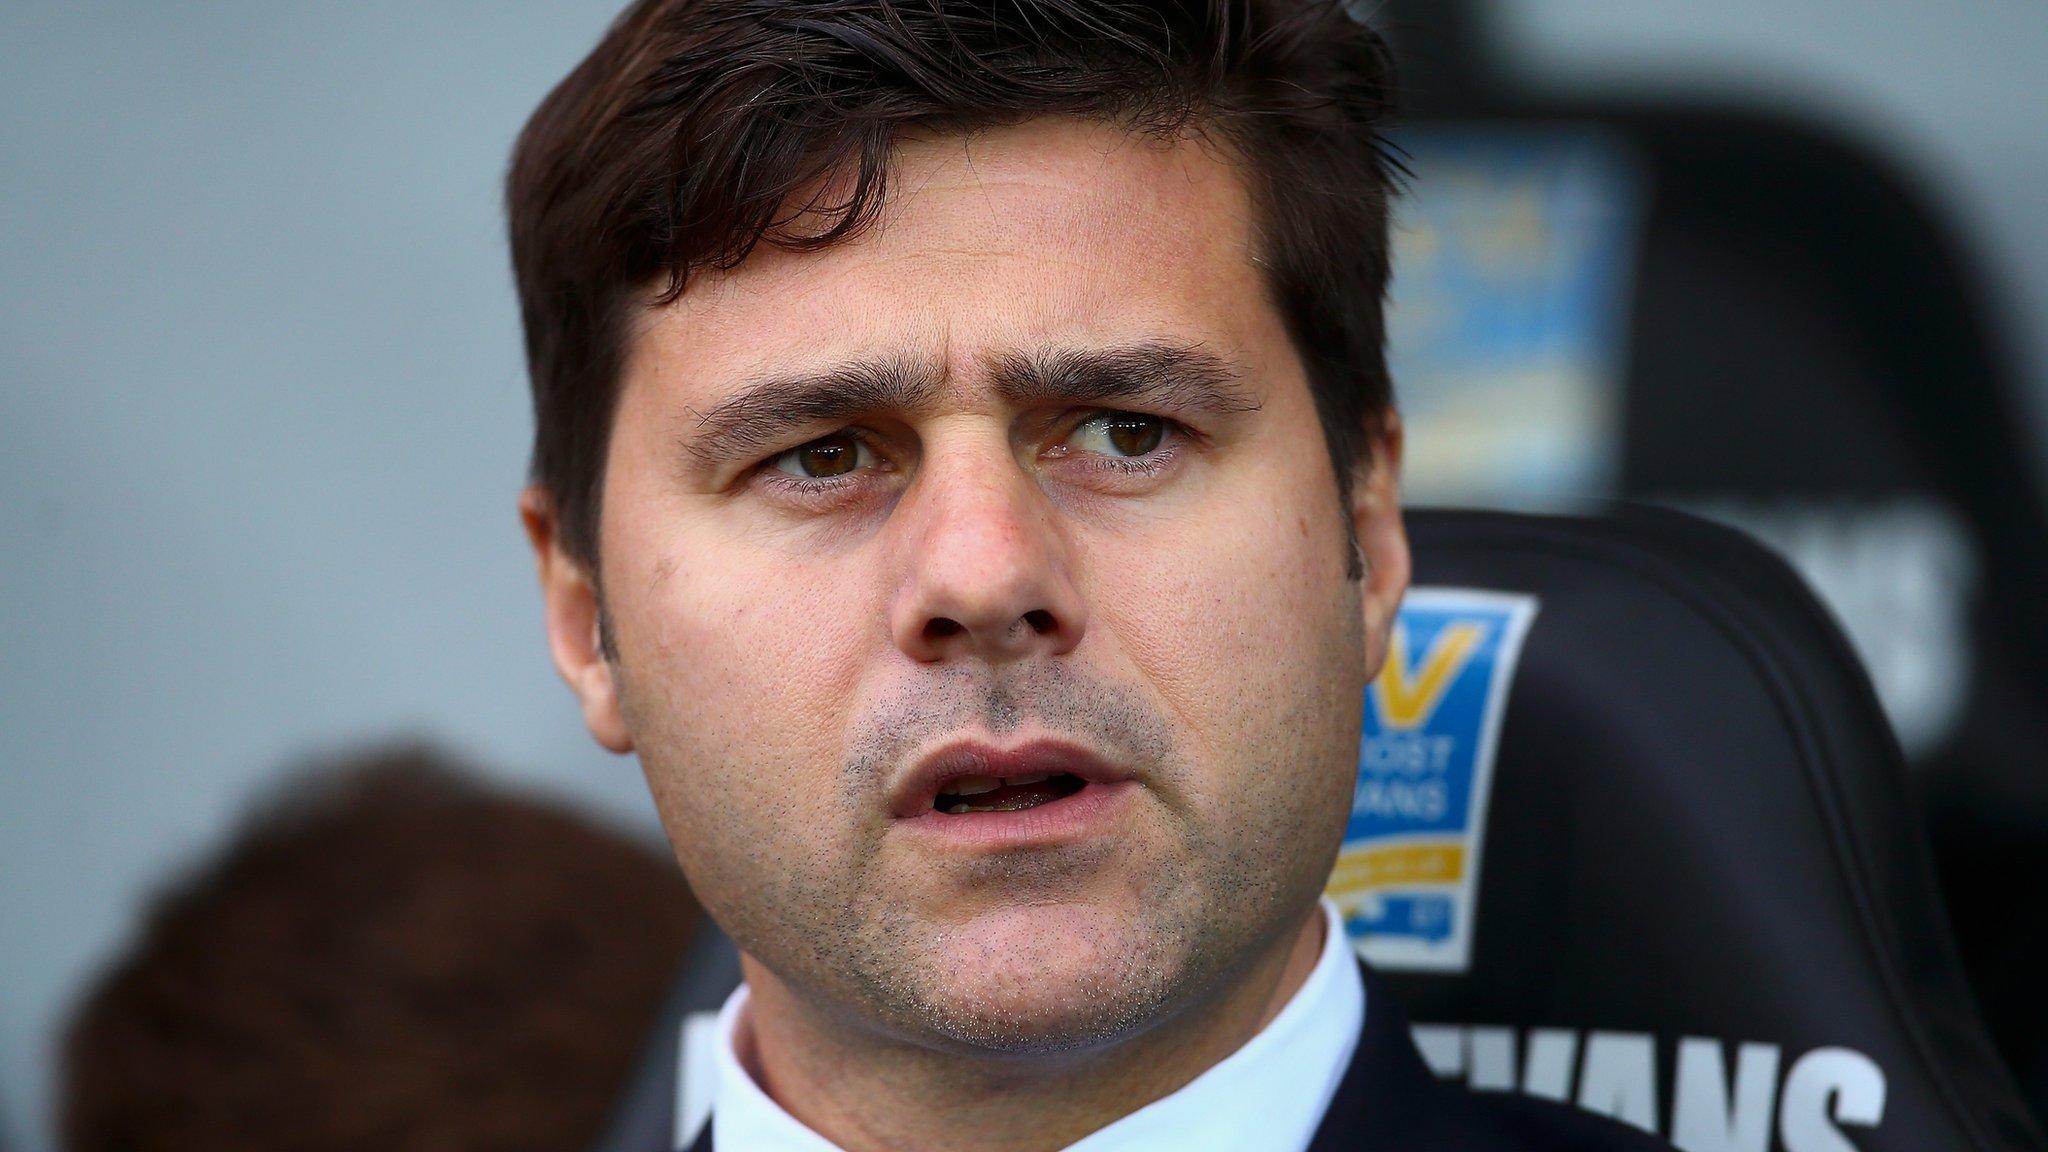 Brighton & Hove Albion v Tottenham Hotspur